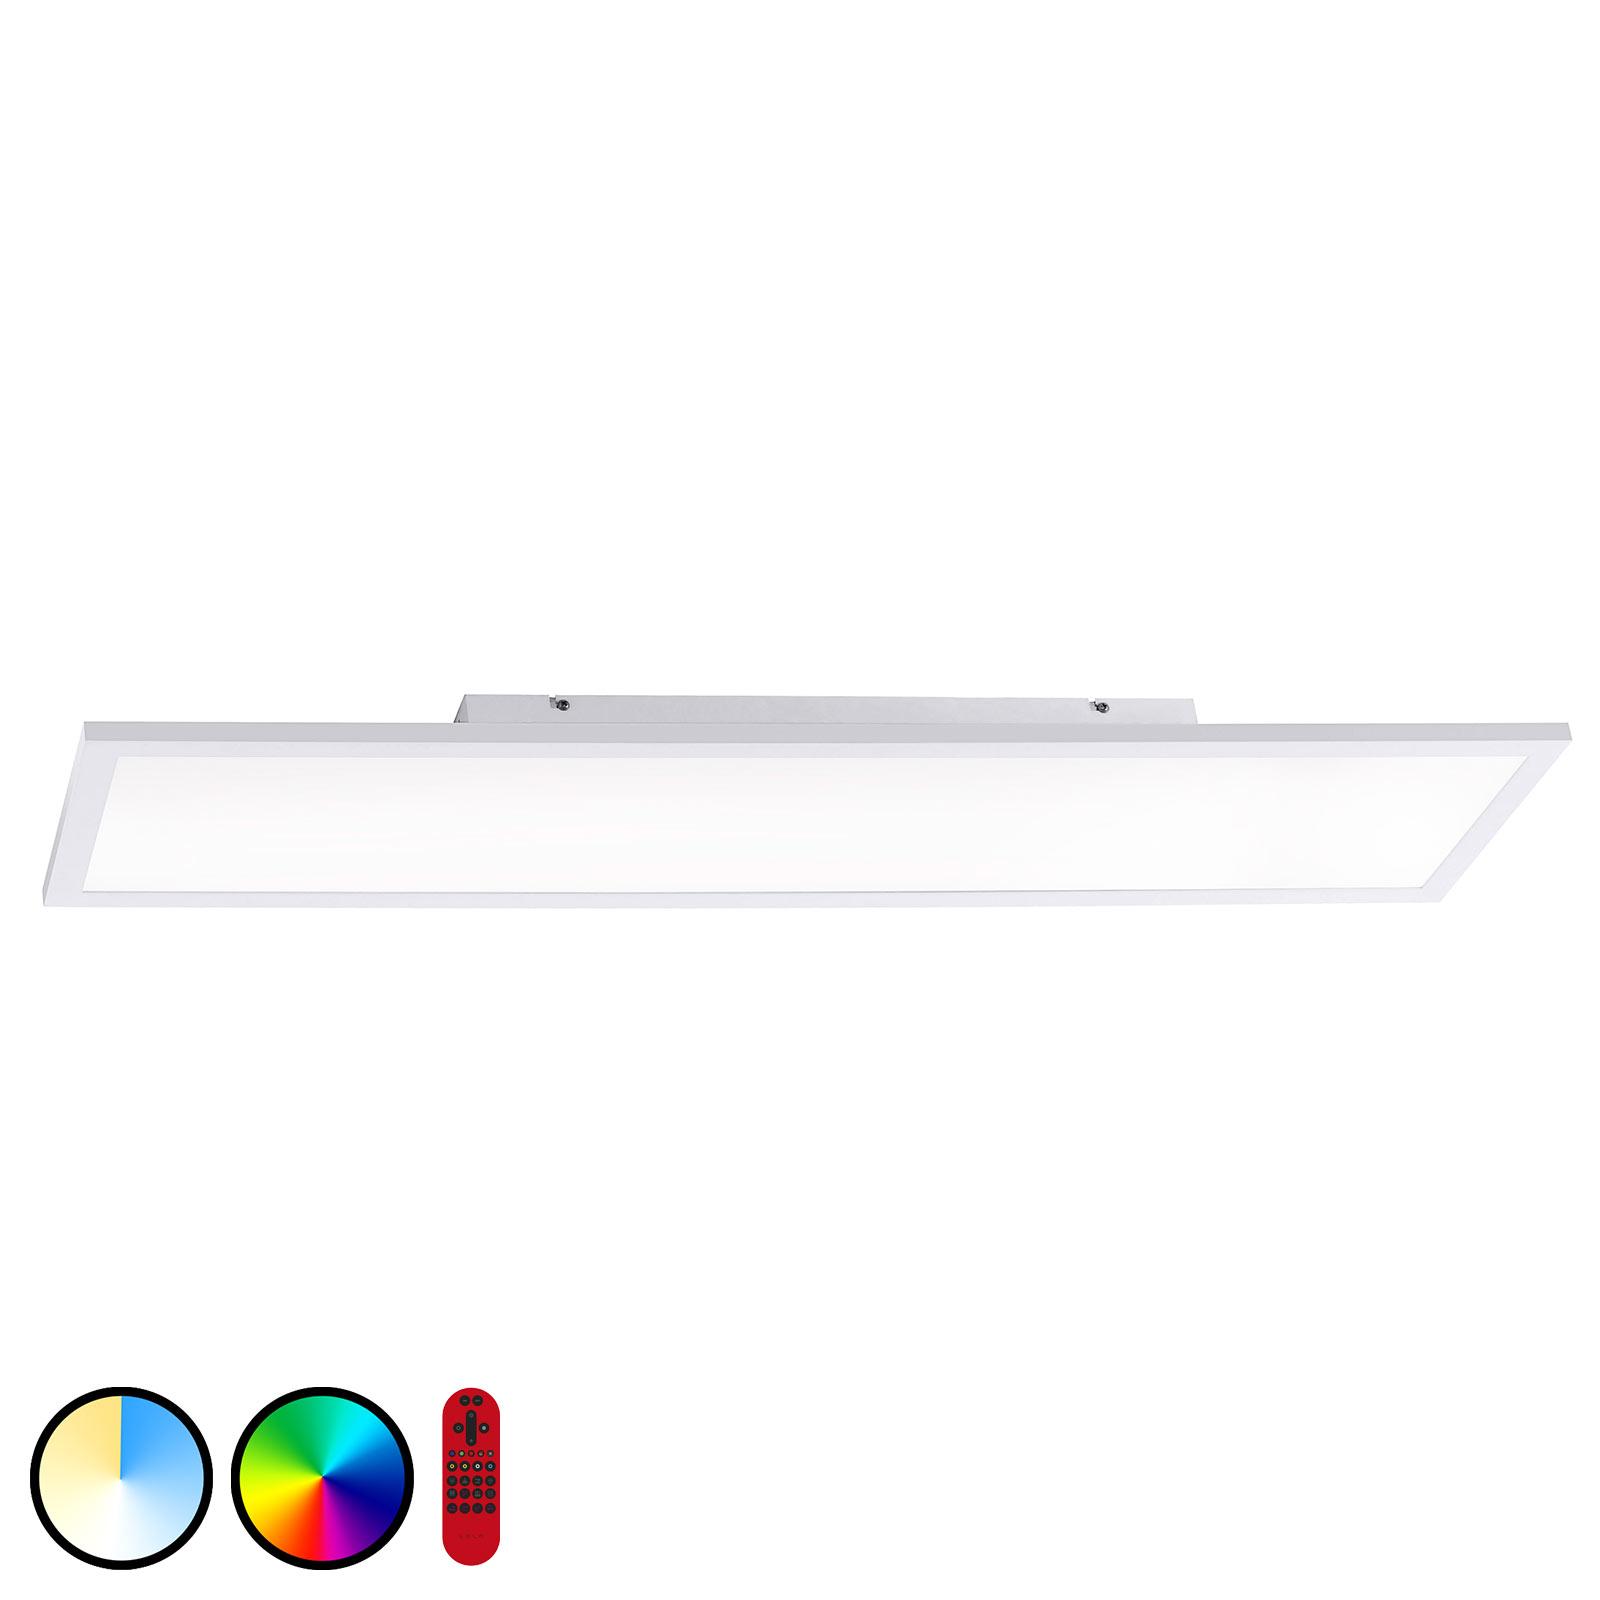 Lampa sufitowa LED LOLAsmart Flat, 100 x 25 cm